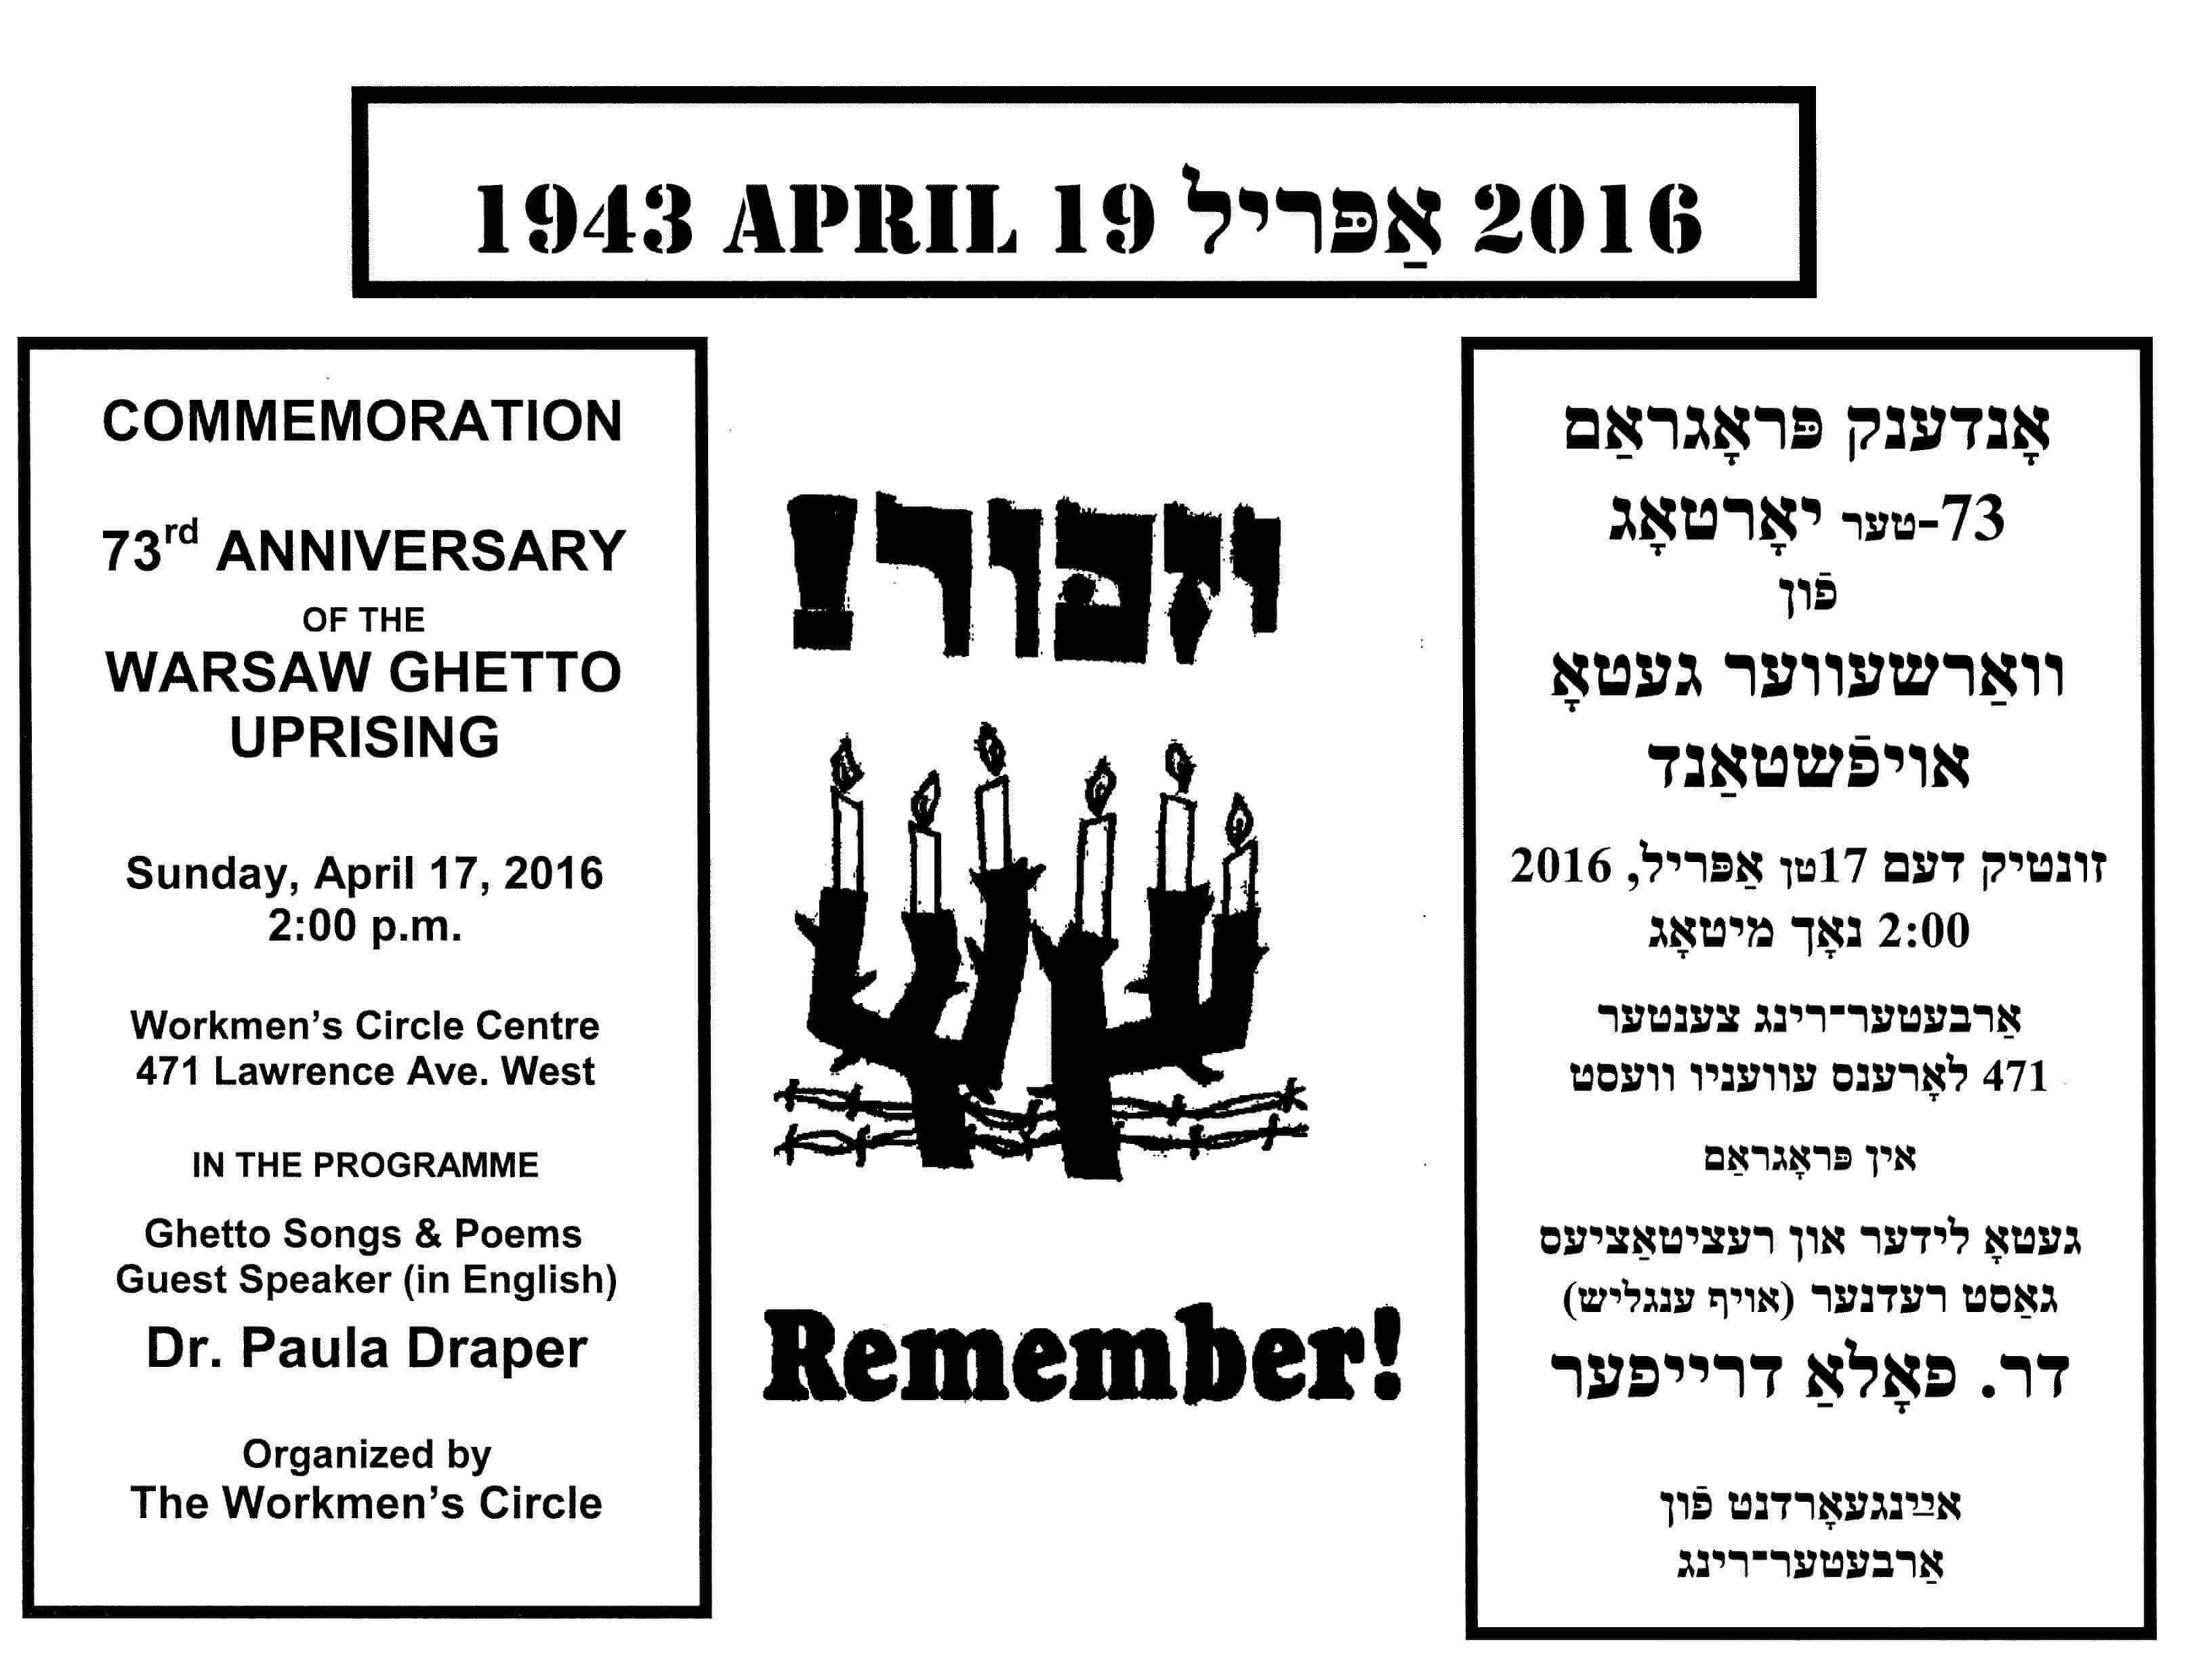 Workmen's Circle  Commemoration - 73rd Anniversary of the Warsaw Ghetto